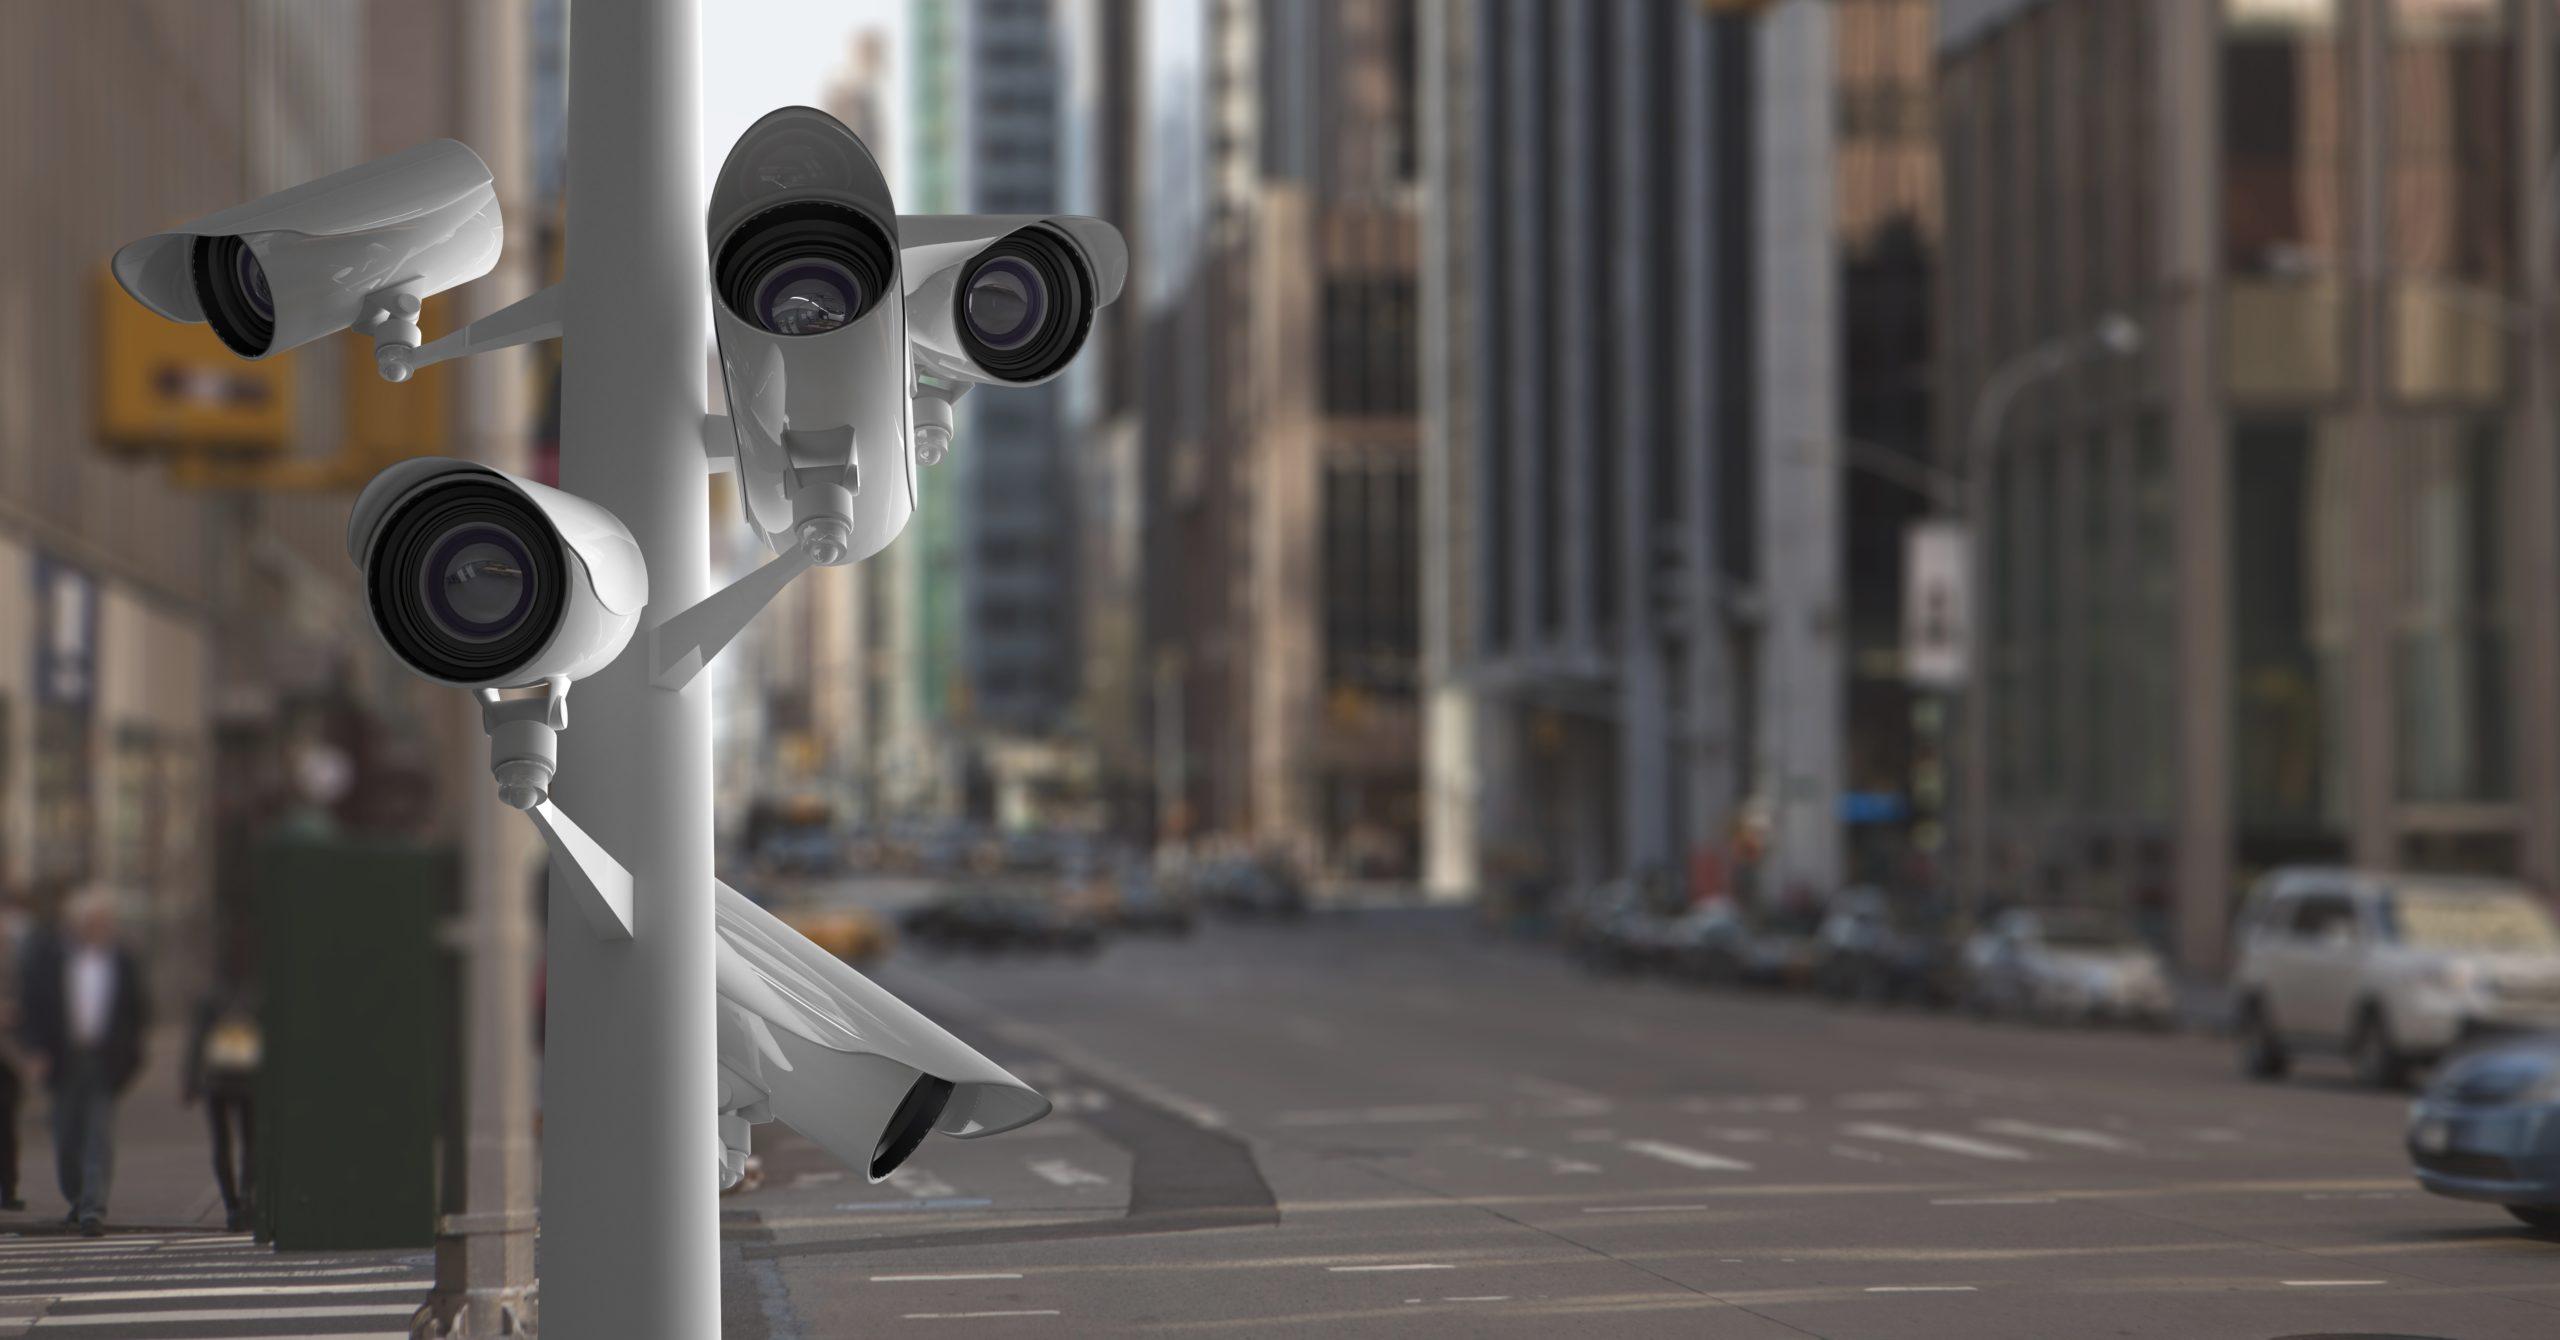 https://adalidmedrano.com/wp-content/uploads/2020/02/camaras-vigilancia-scaled.jpg